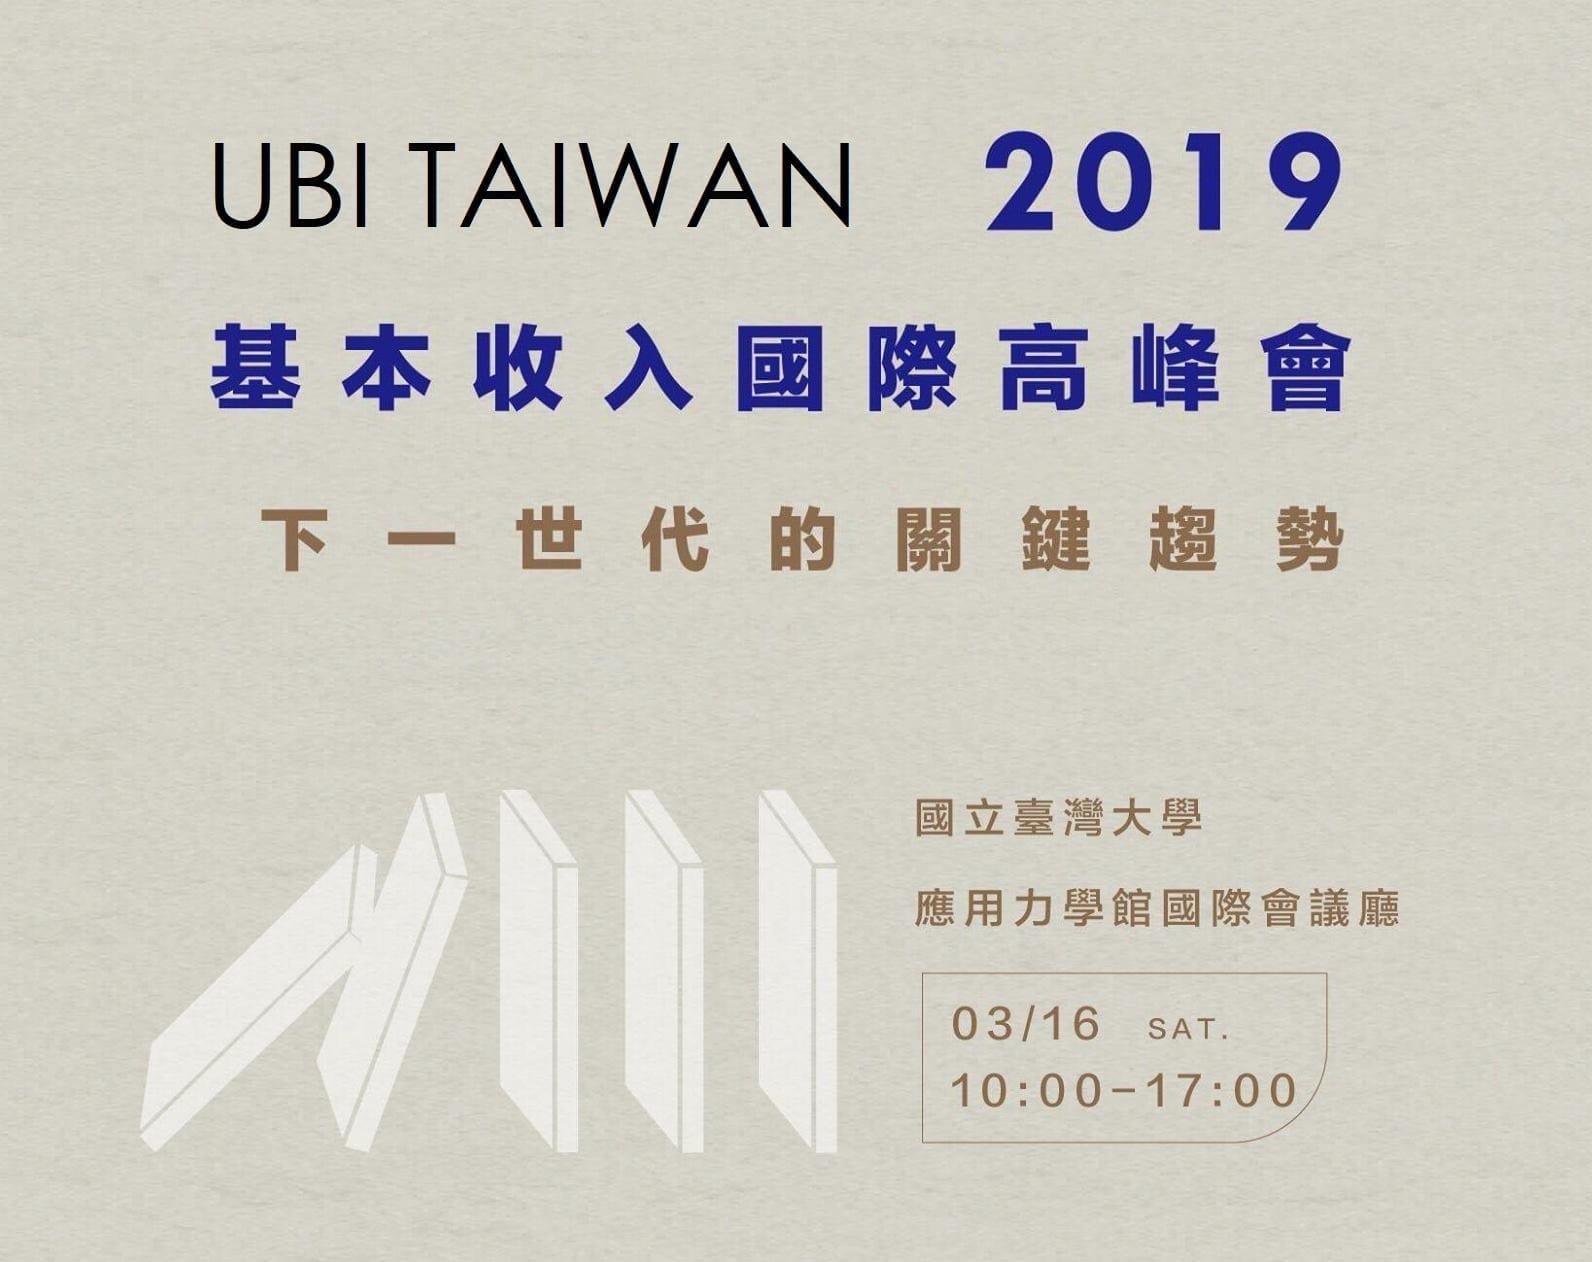 UBI Taiwan to discuss 'key trends' at international summit